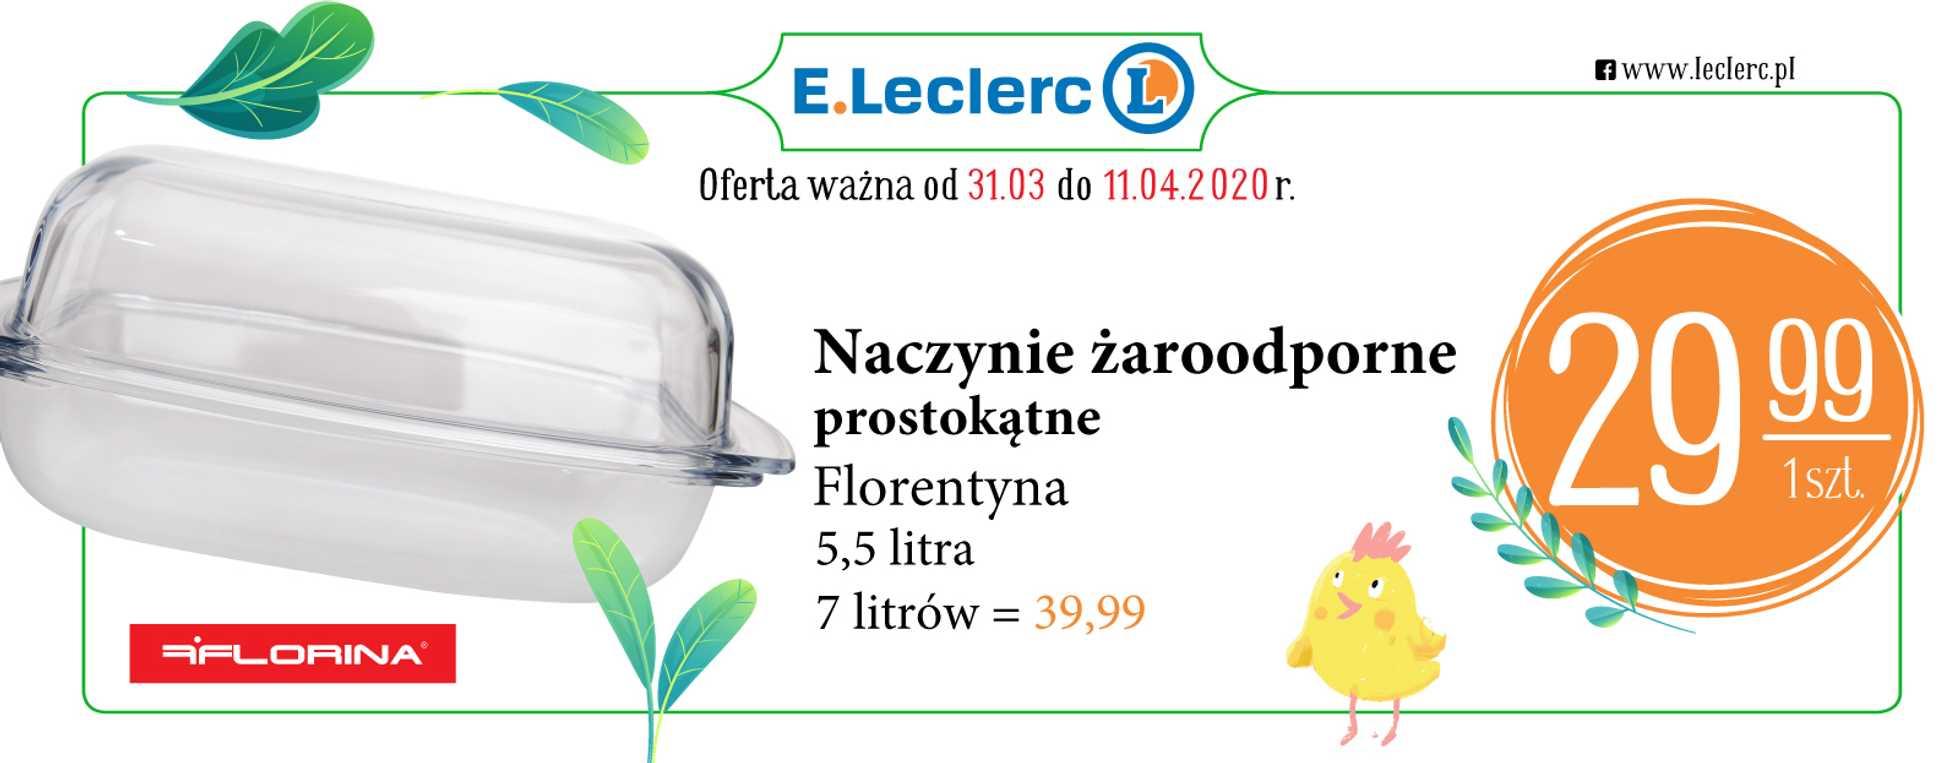 E.Leclerc - gazetka promocyjna ważna od 31.03.2020 do 11.04.2020 - strona 1.